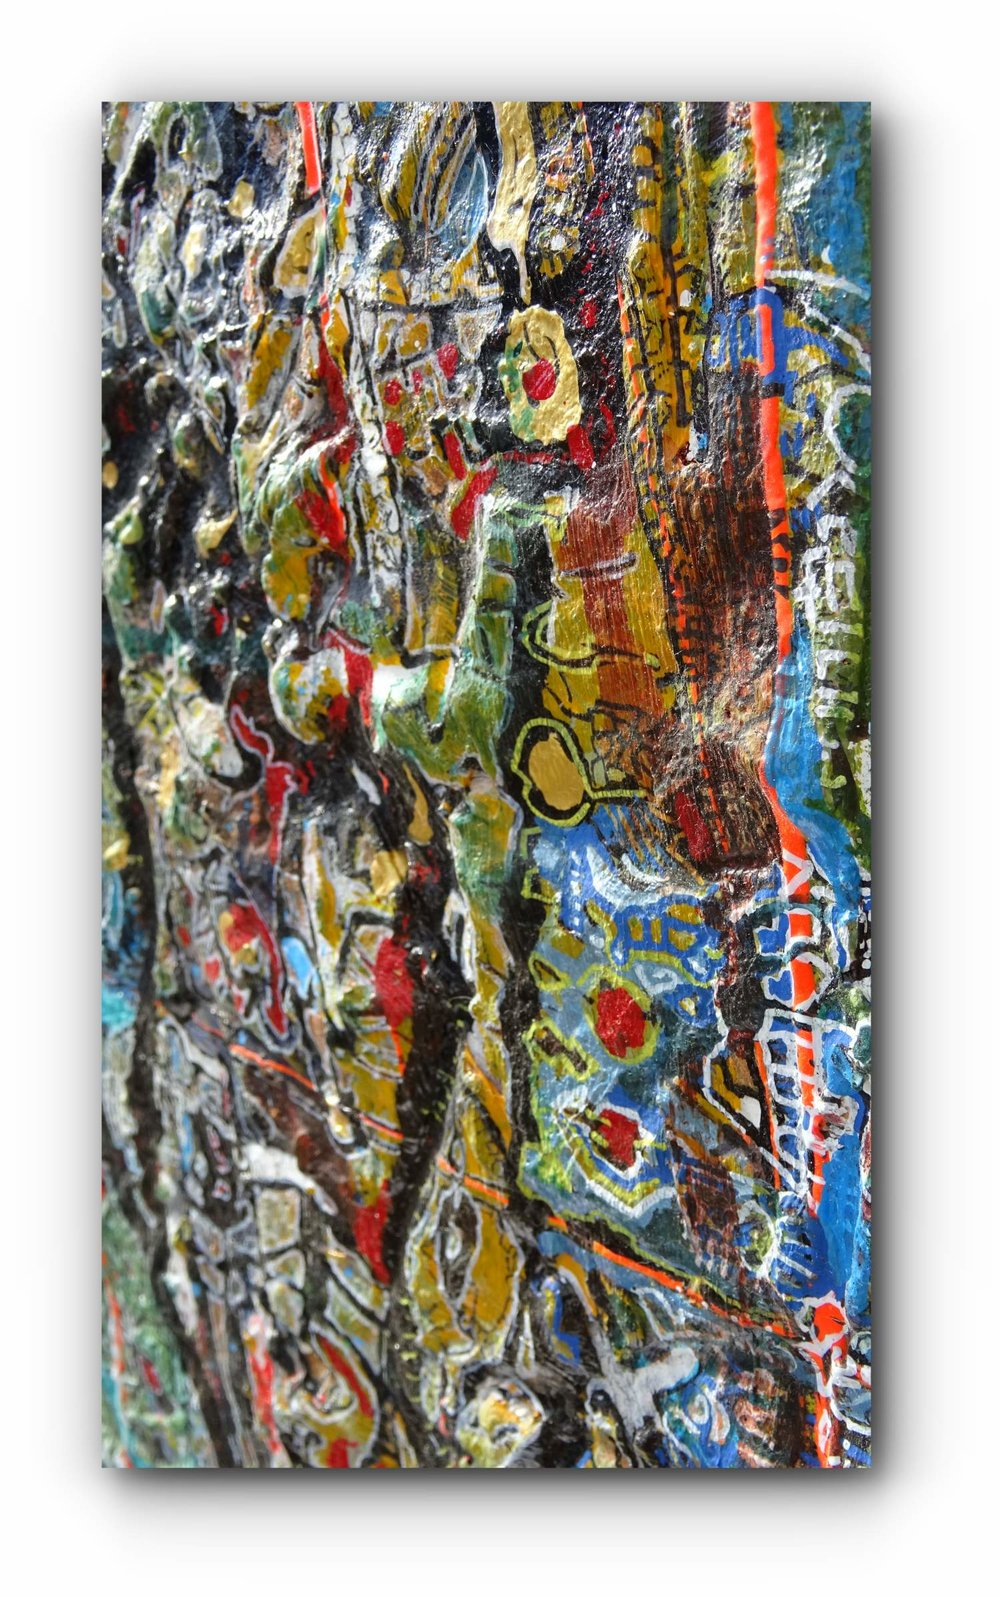 painting-detail-3-ritual-five-artists-ingress-vortices.jpg